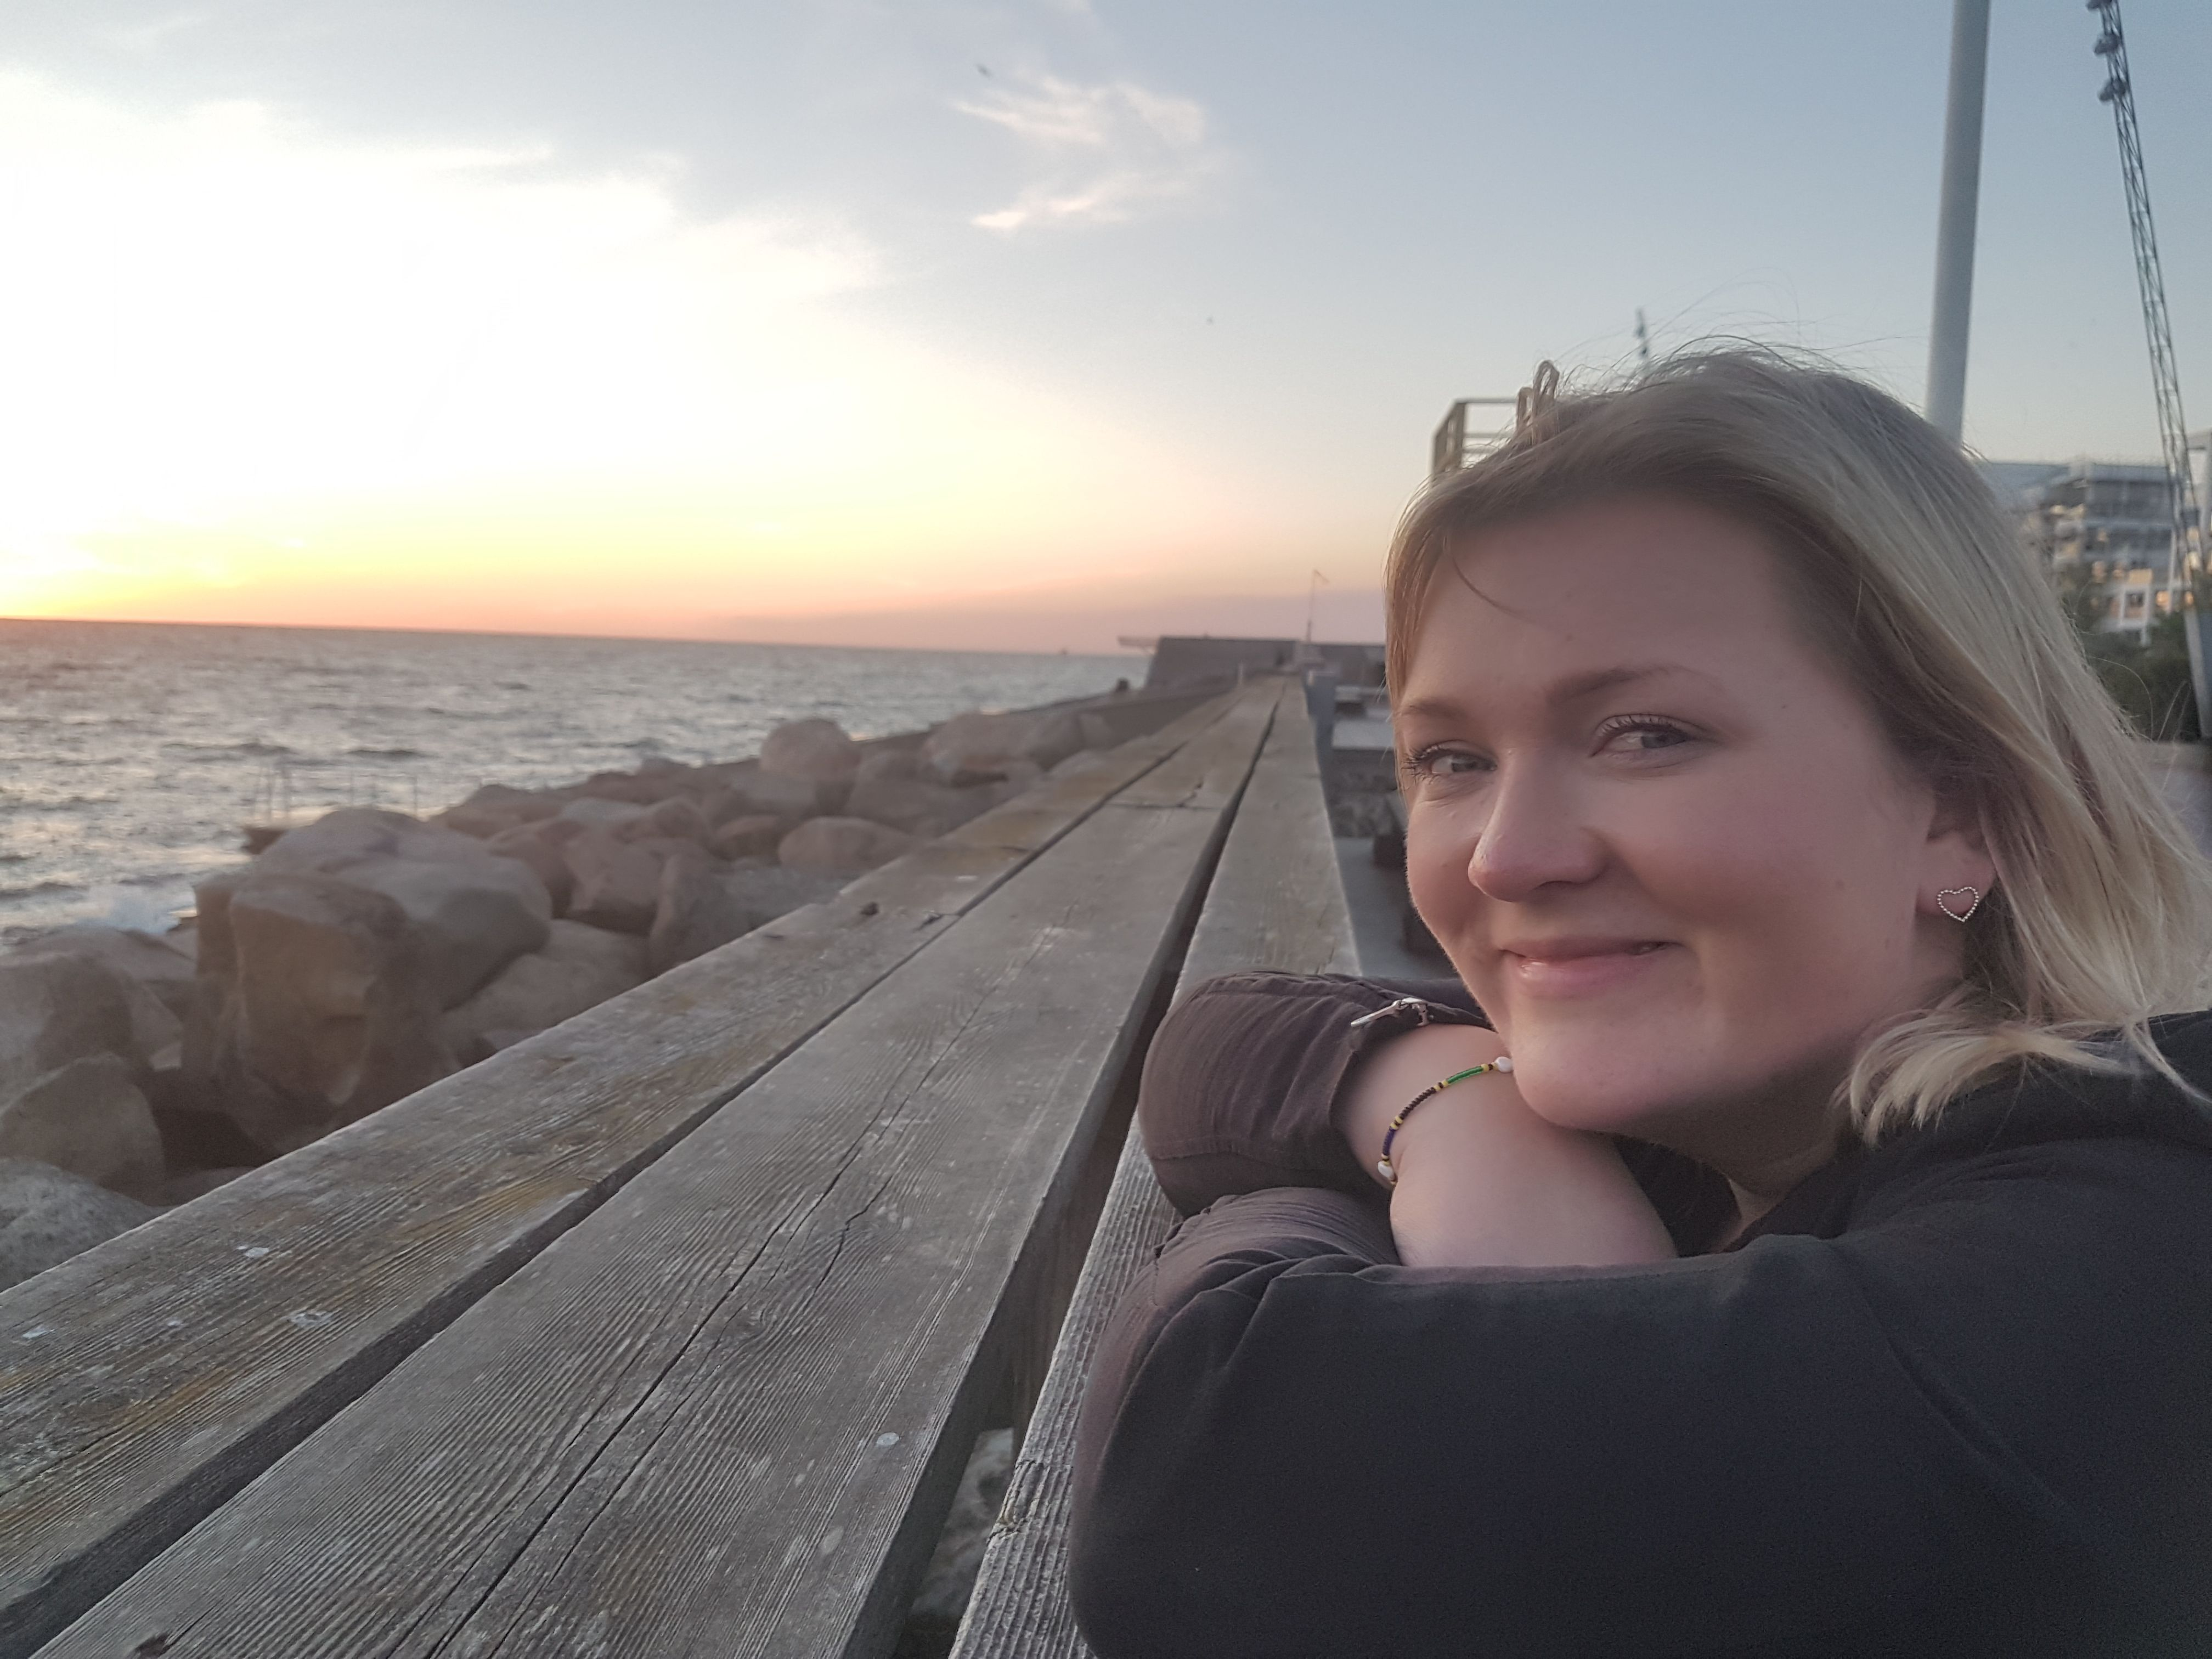 malmo single girls Meet singles in malmö sign up for free páratlan english deutsch english magyar meet malmö single men seeking women ternai, 39 online dating malm.